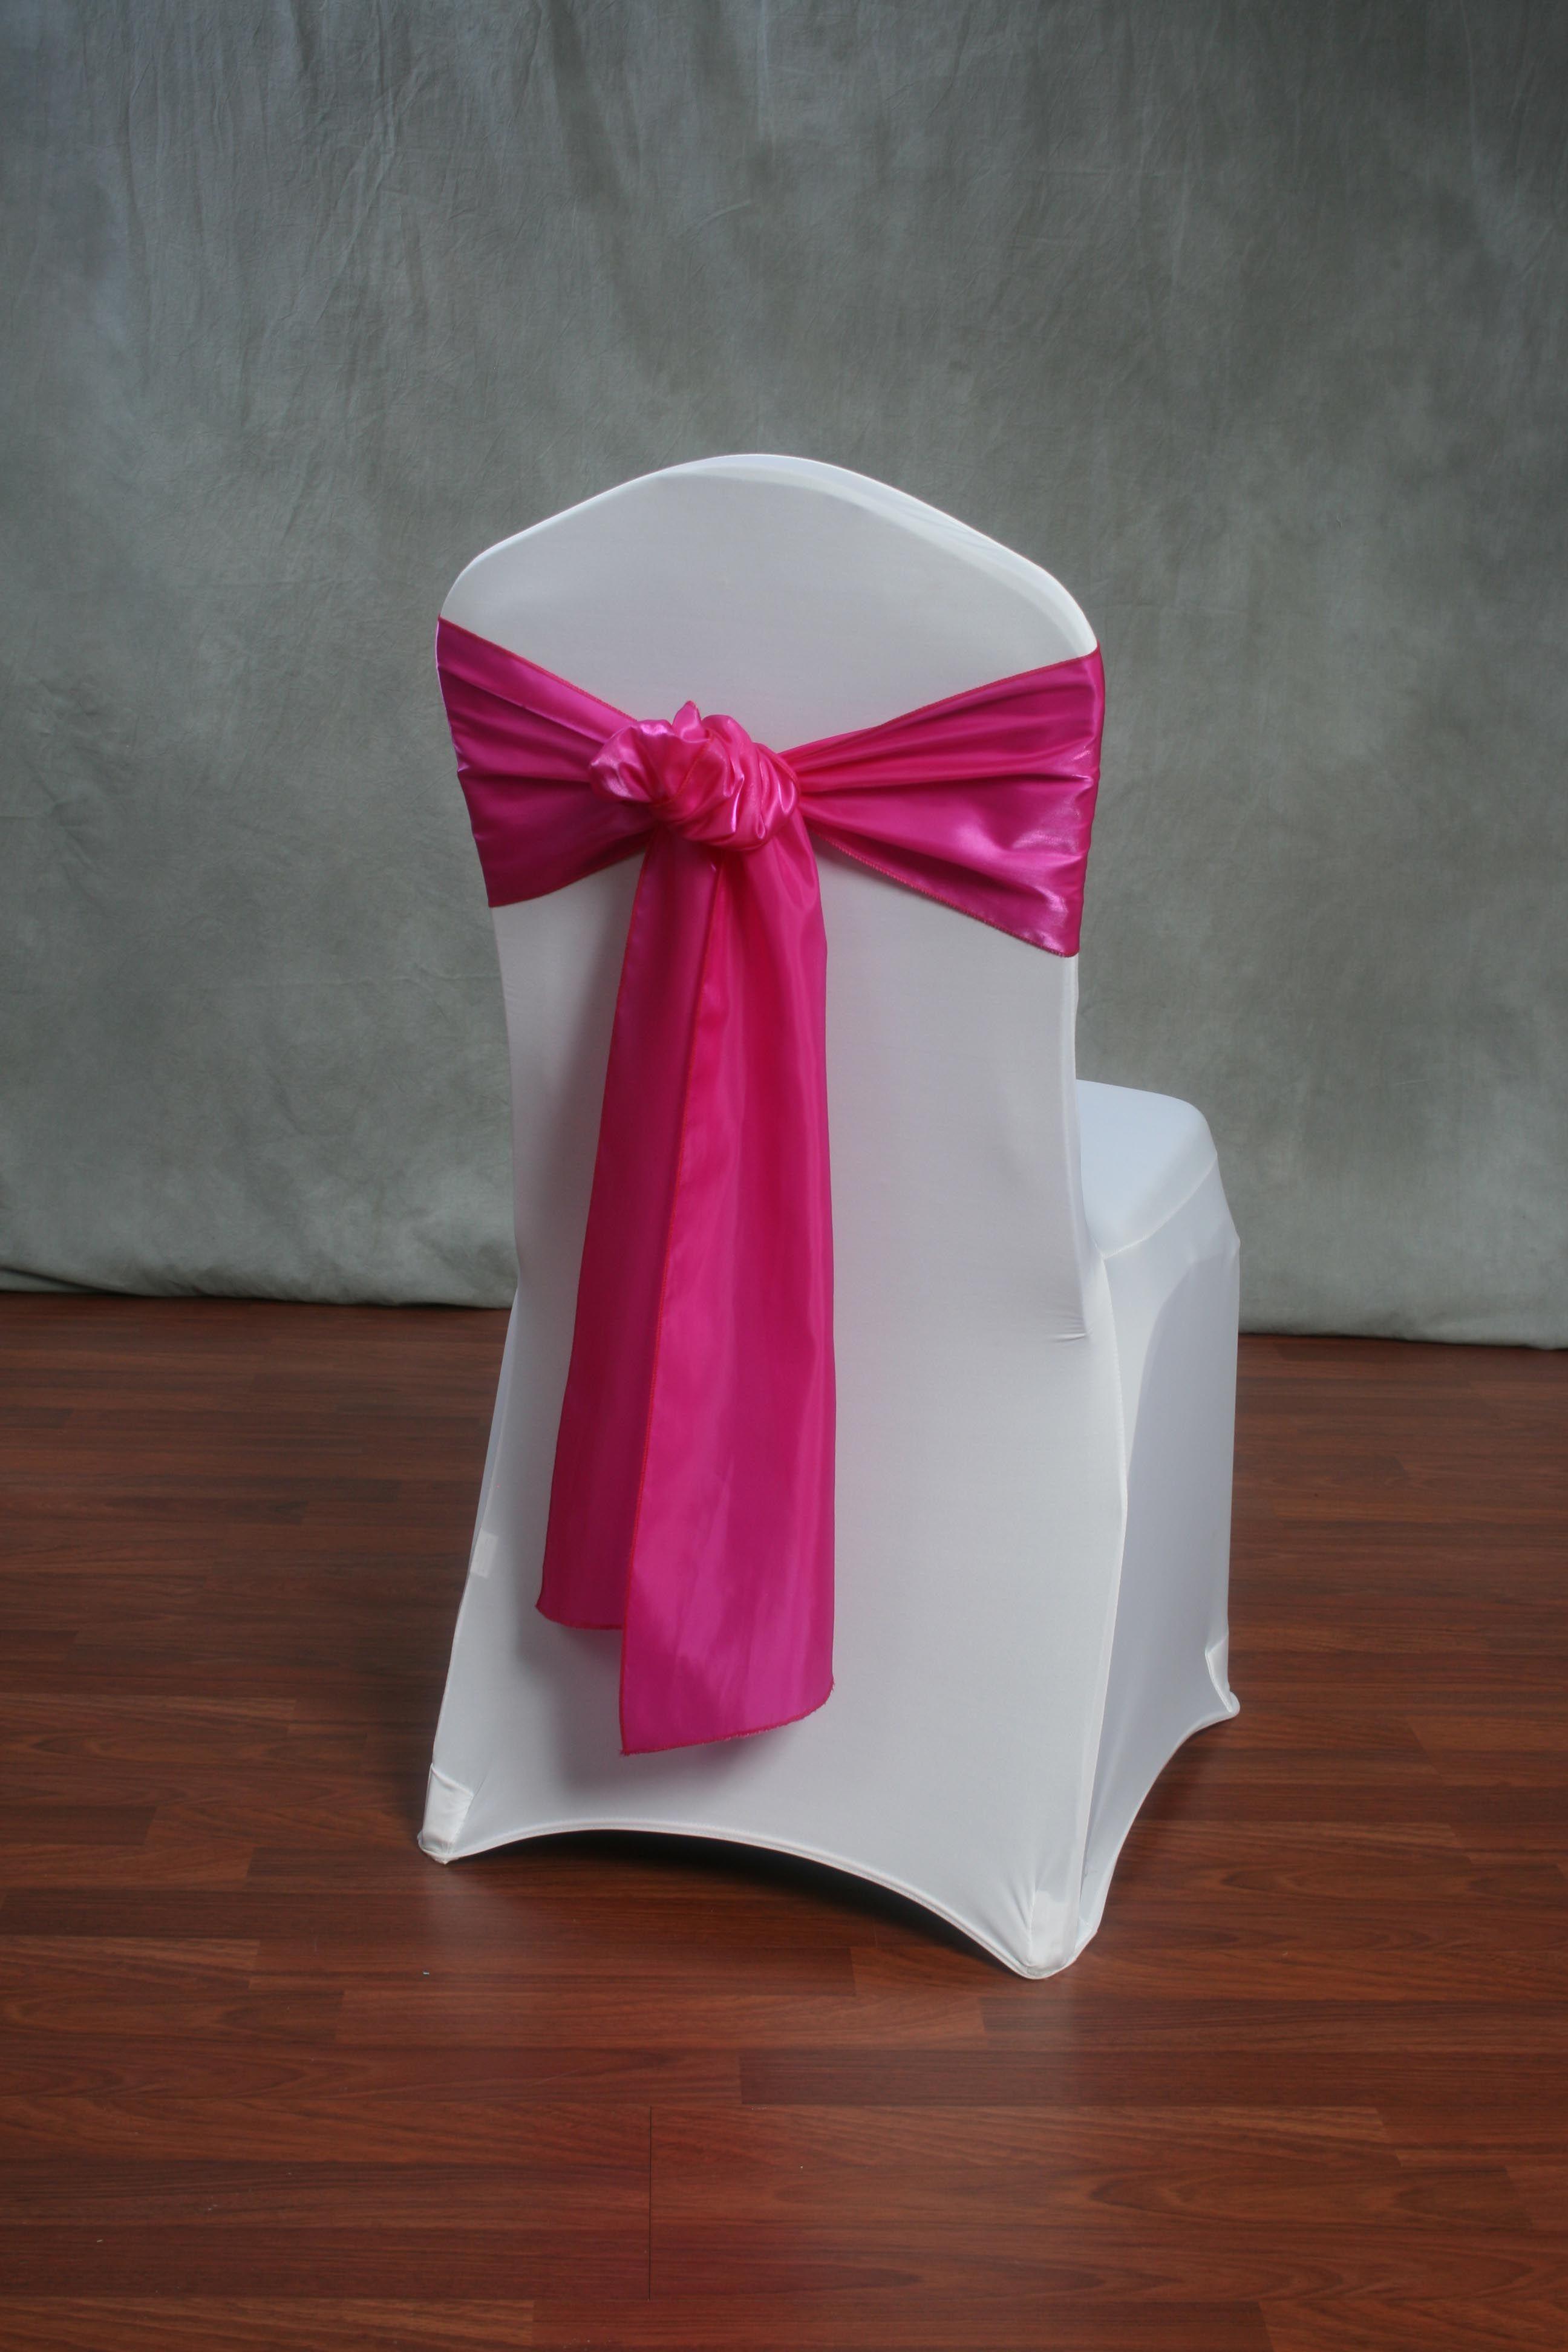 chair cover elegance antique wooden rocking styles beyond fuchsia organza satin sash on a white stretch